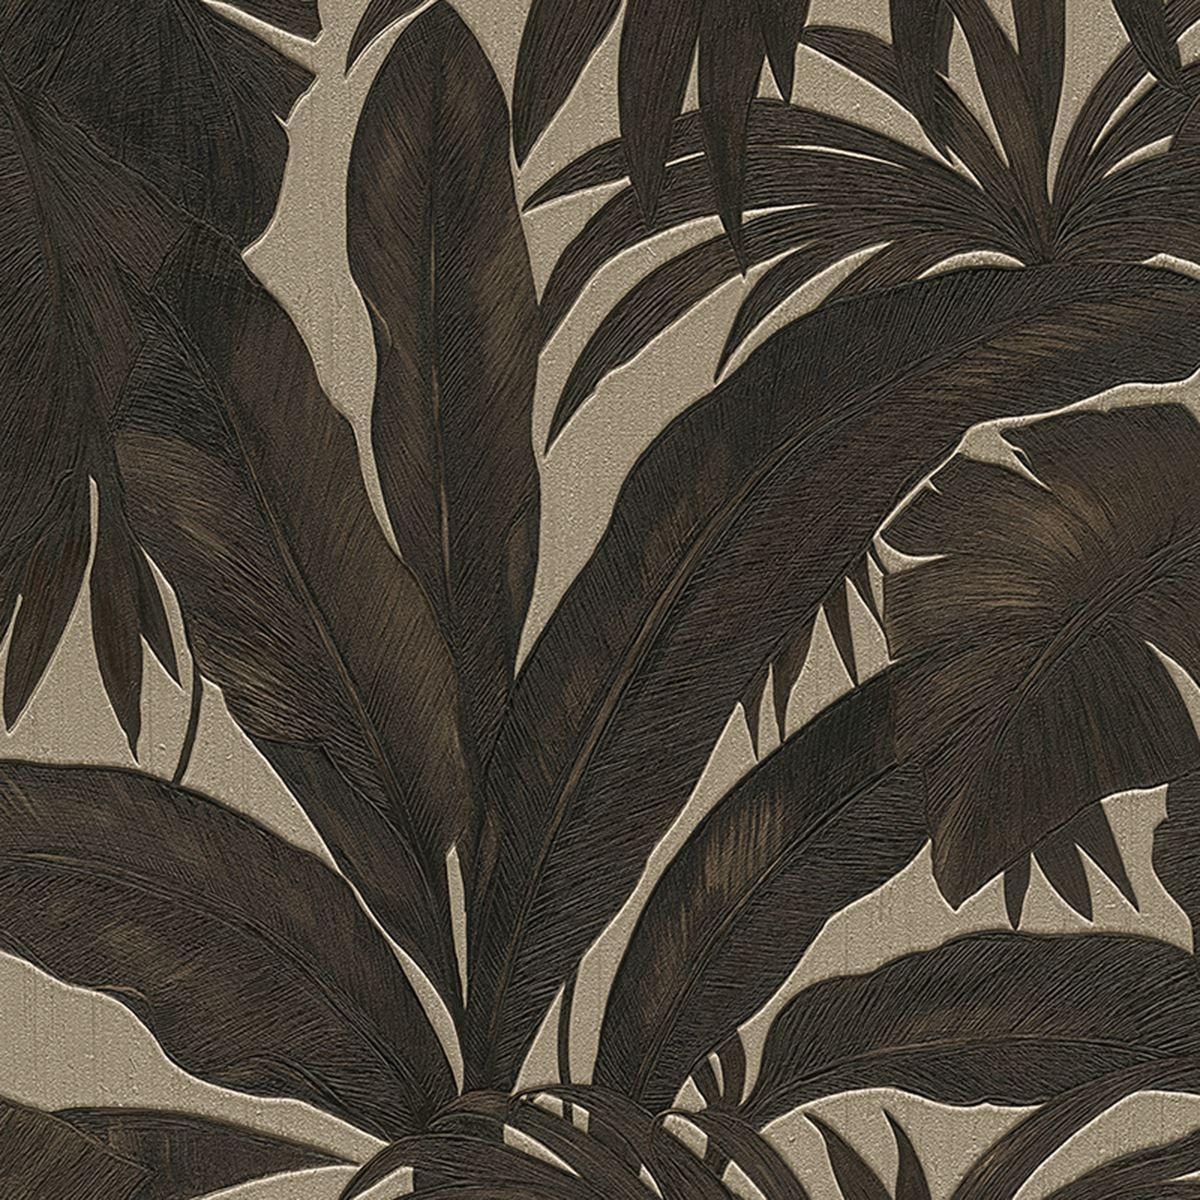 Versace Giungla Palmier Feuilles Luxe Papier Peint Metallise Noir